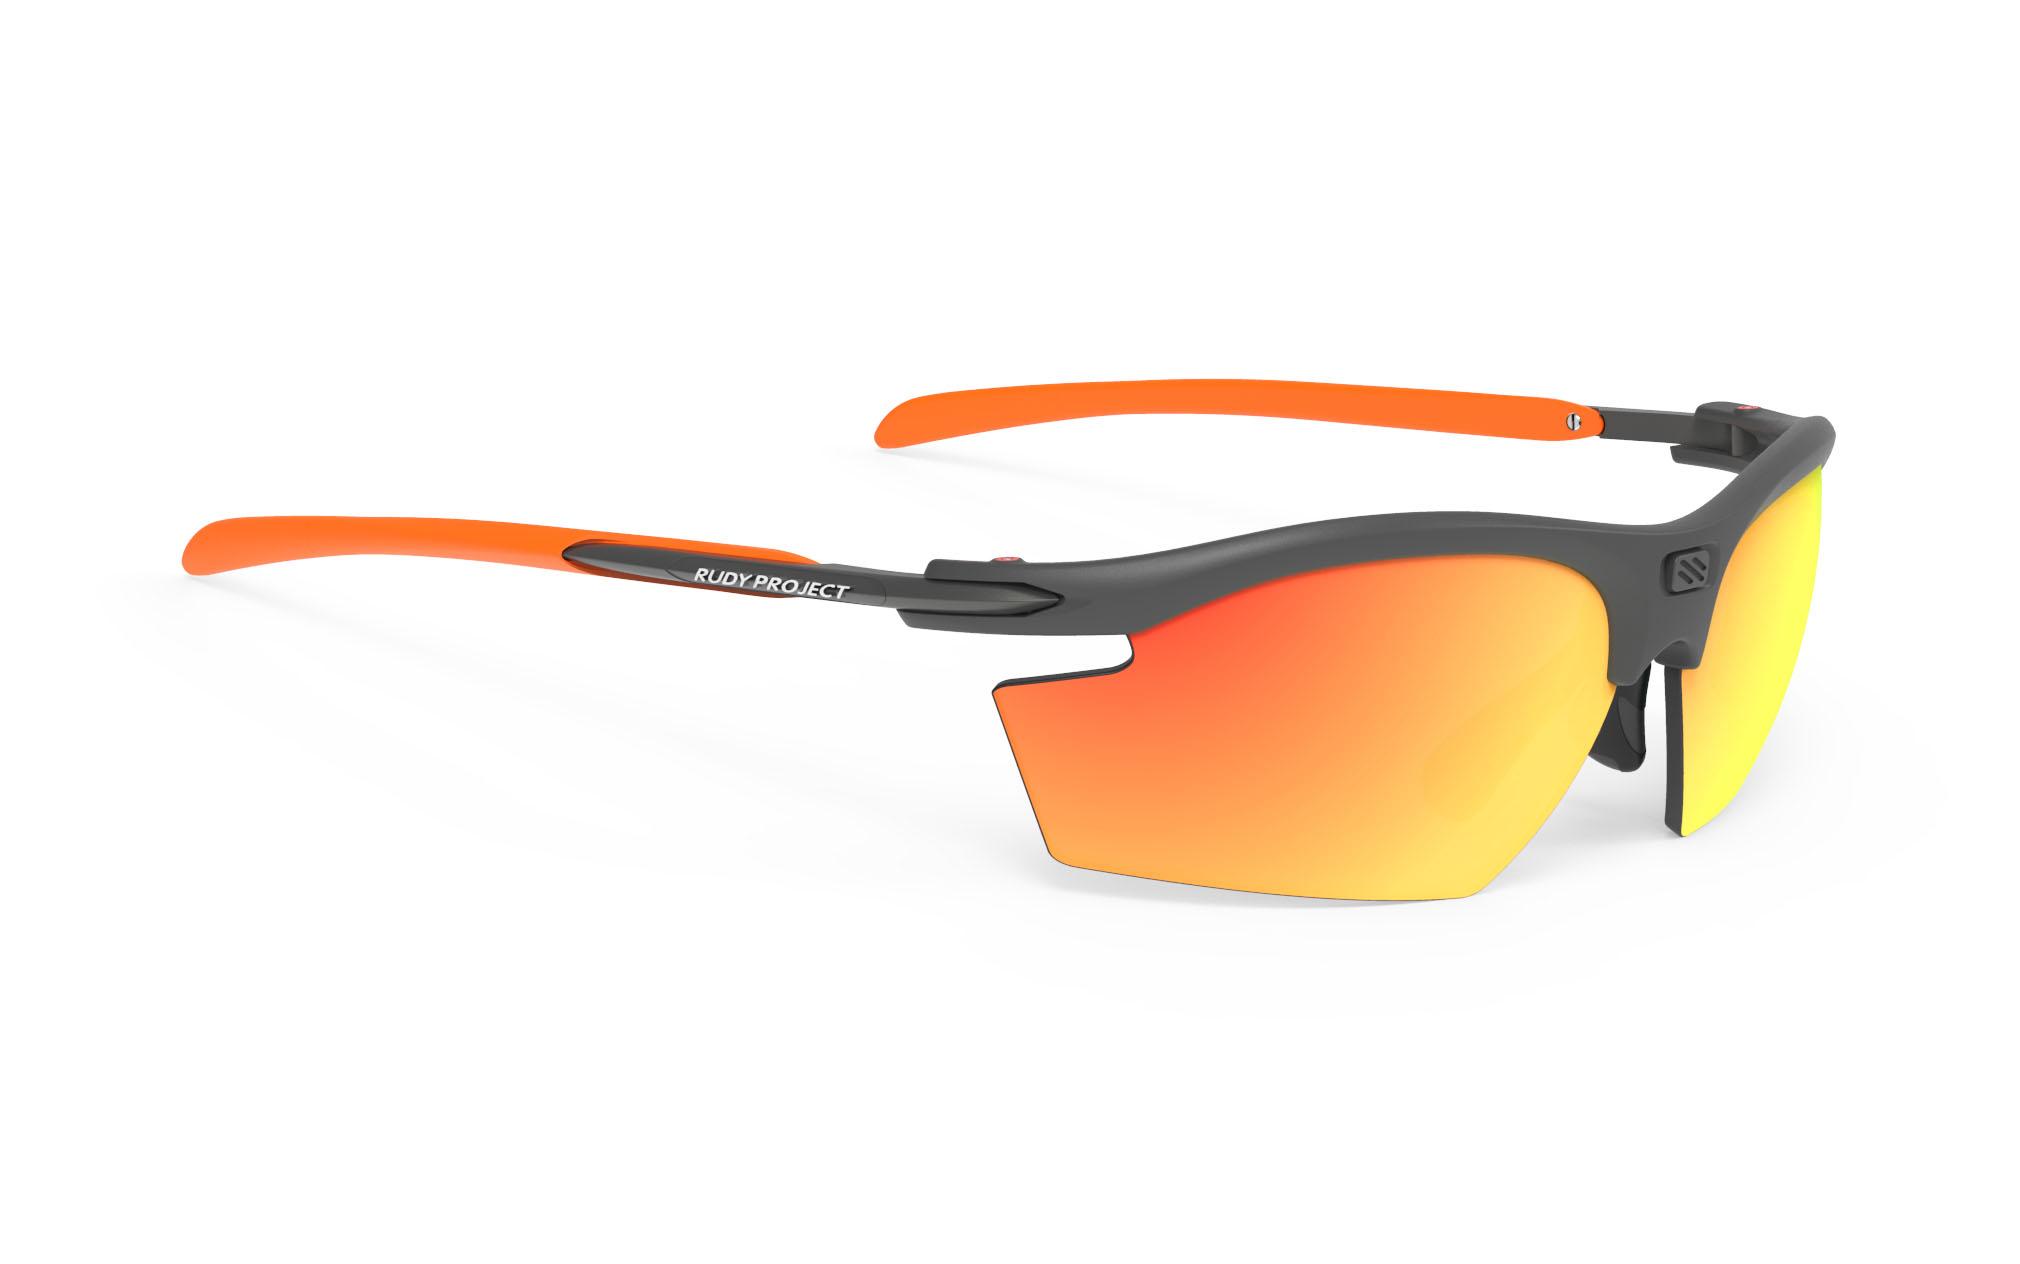 Rydon NEW Graphite Polar 3FX HDR Multilaser Orange